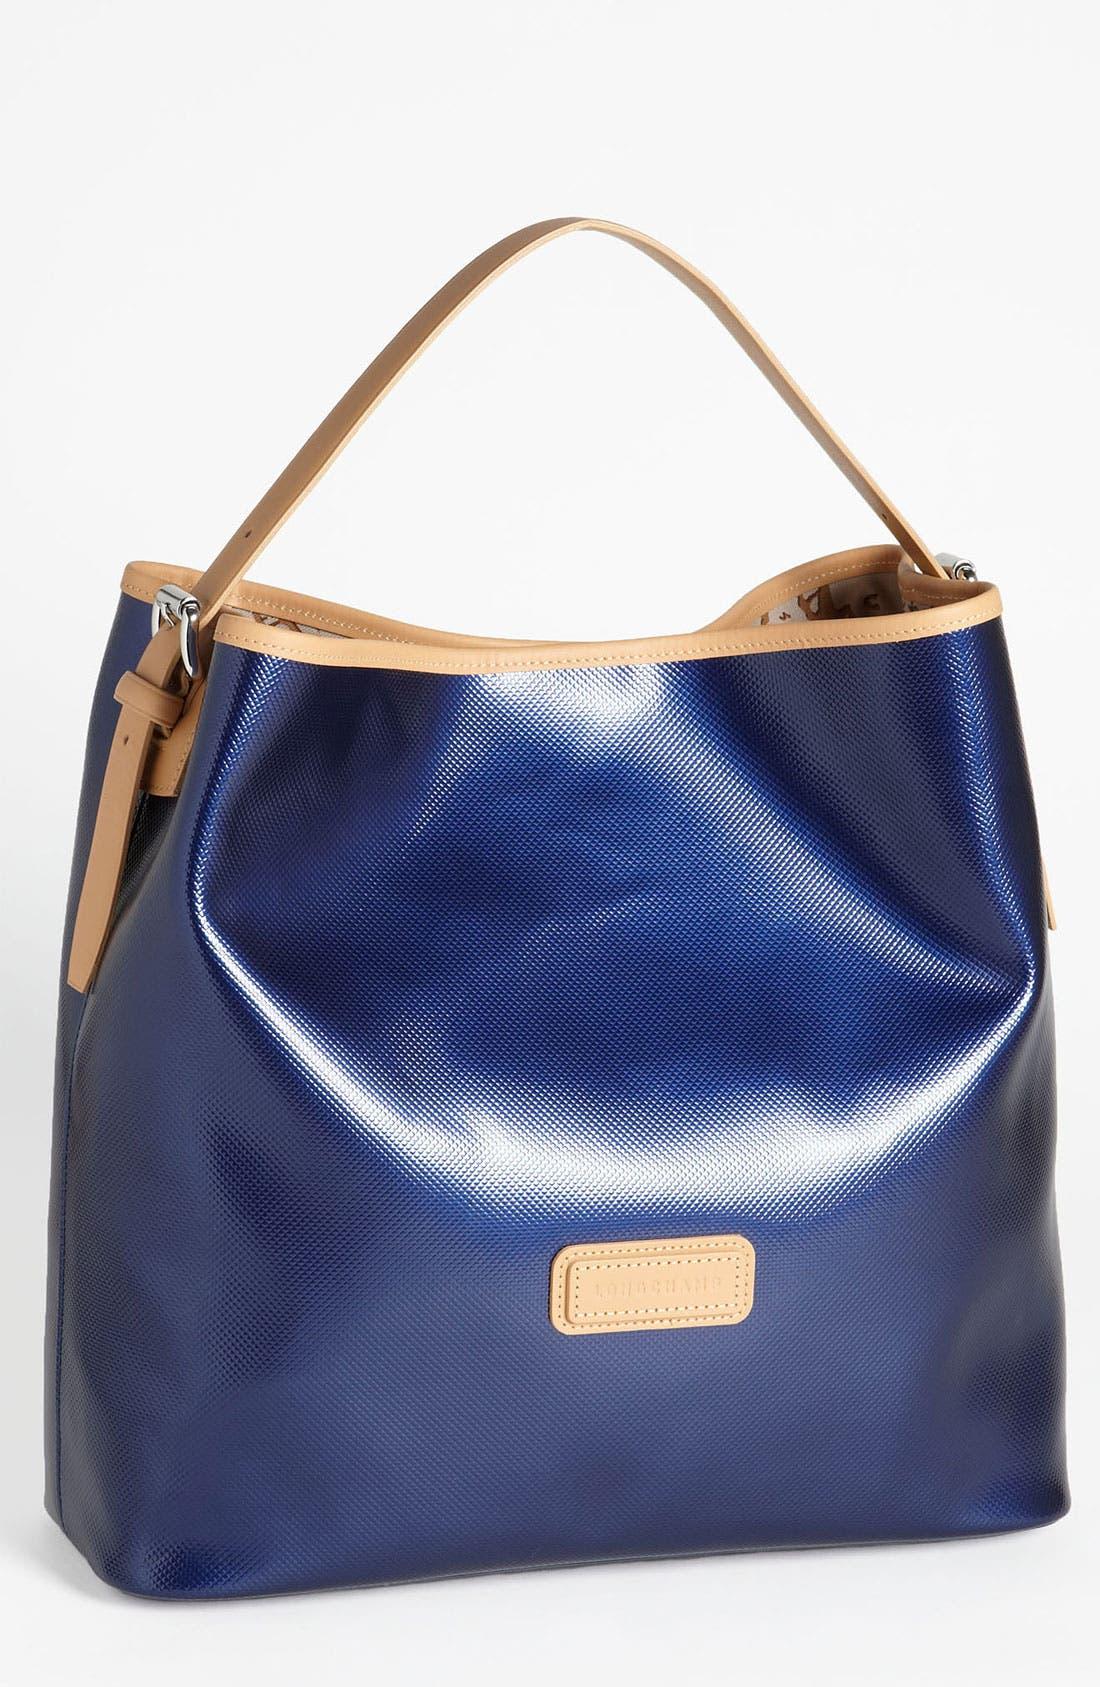 Main Image - Longchamp 'Derby Verni' Hobo